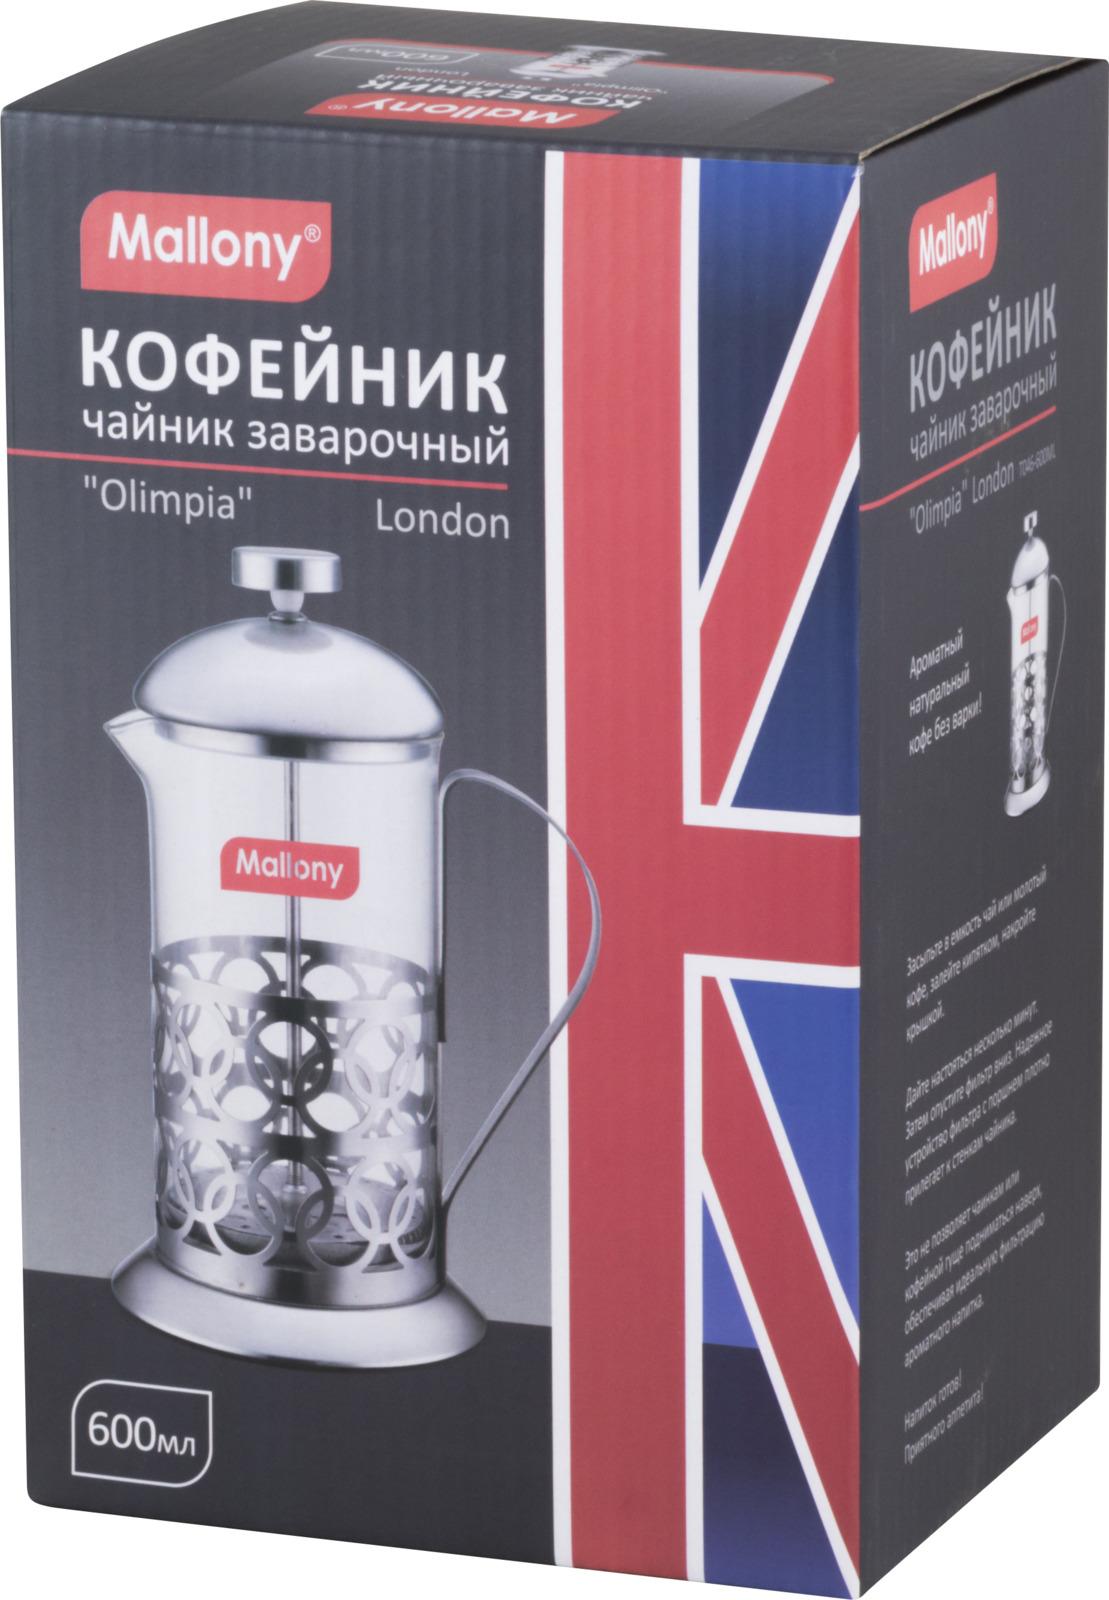 Кофе-пресс Mallony London, цвет: серебристый, 600 мл mallony кофе пресс стеклянный gfp01 1000ml o mallony оранжевый